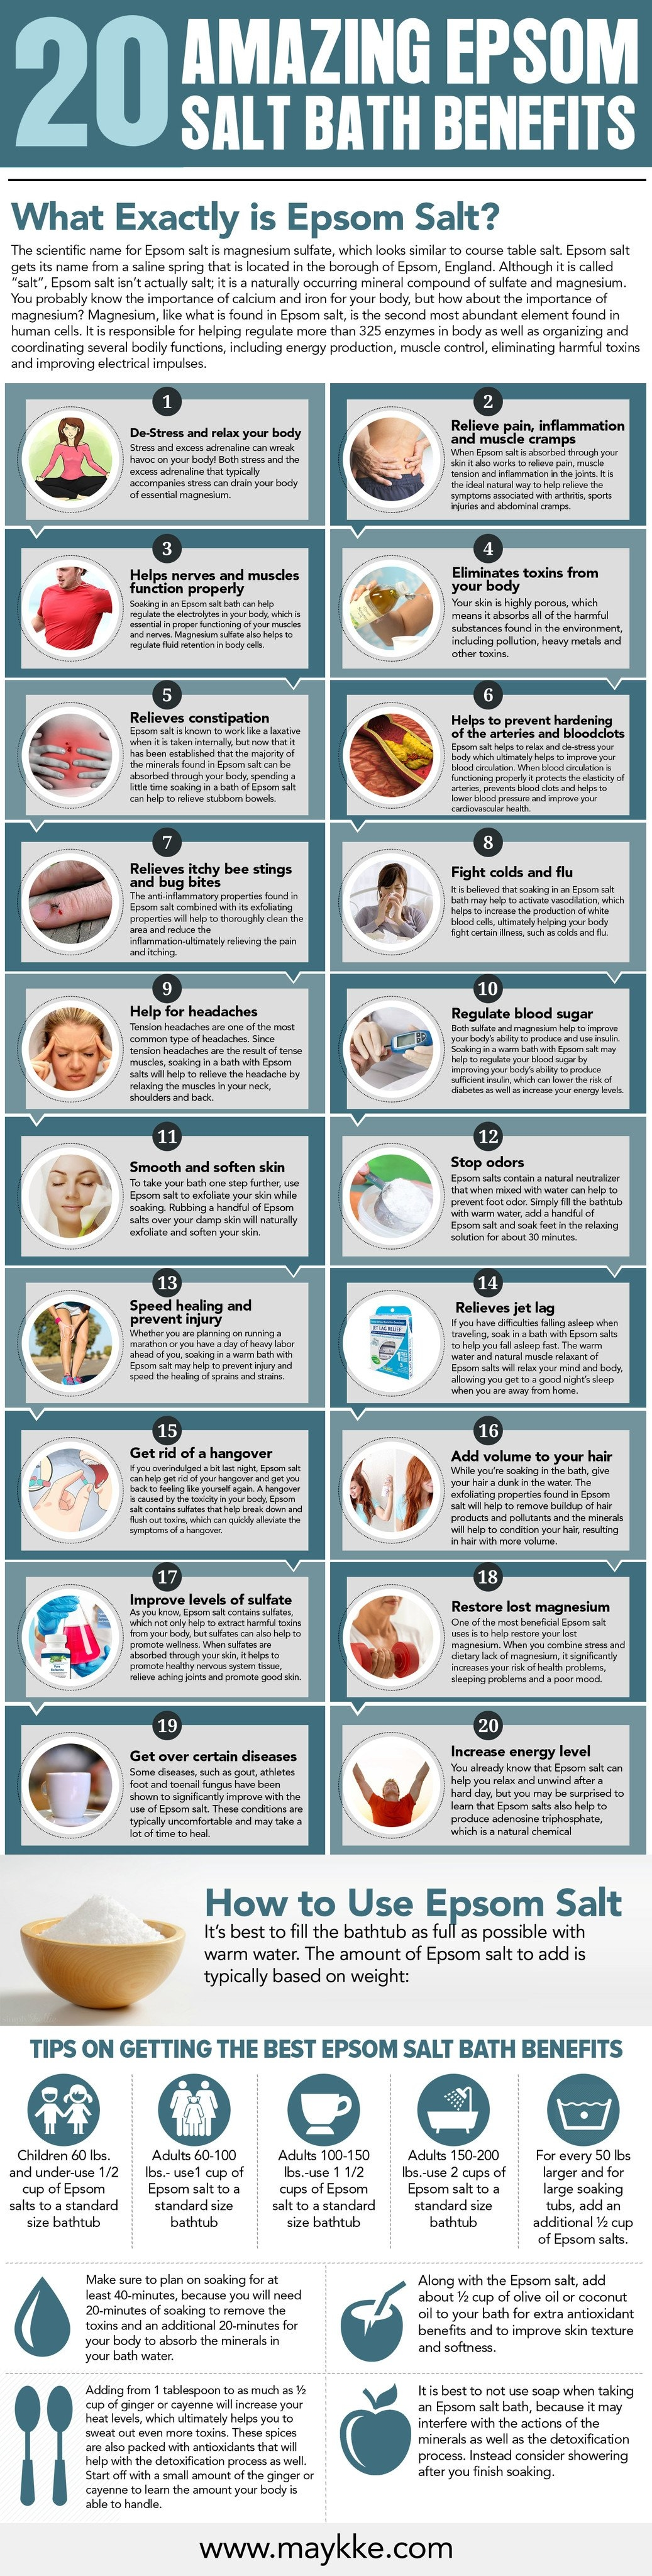 20 Amazing Epsom Salt Bath Benefits